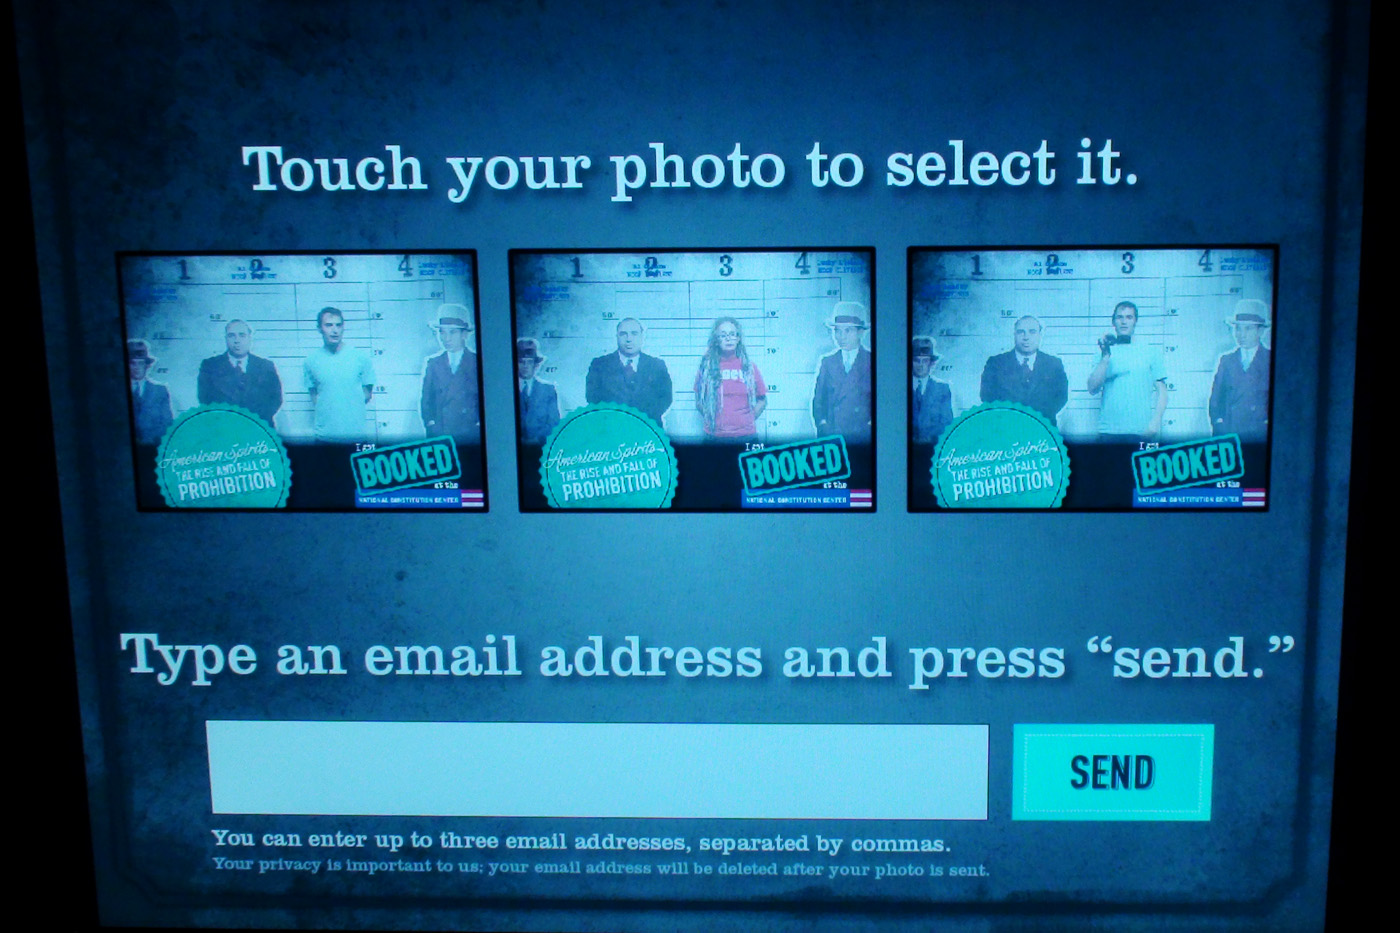 photo selection interface